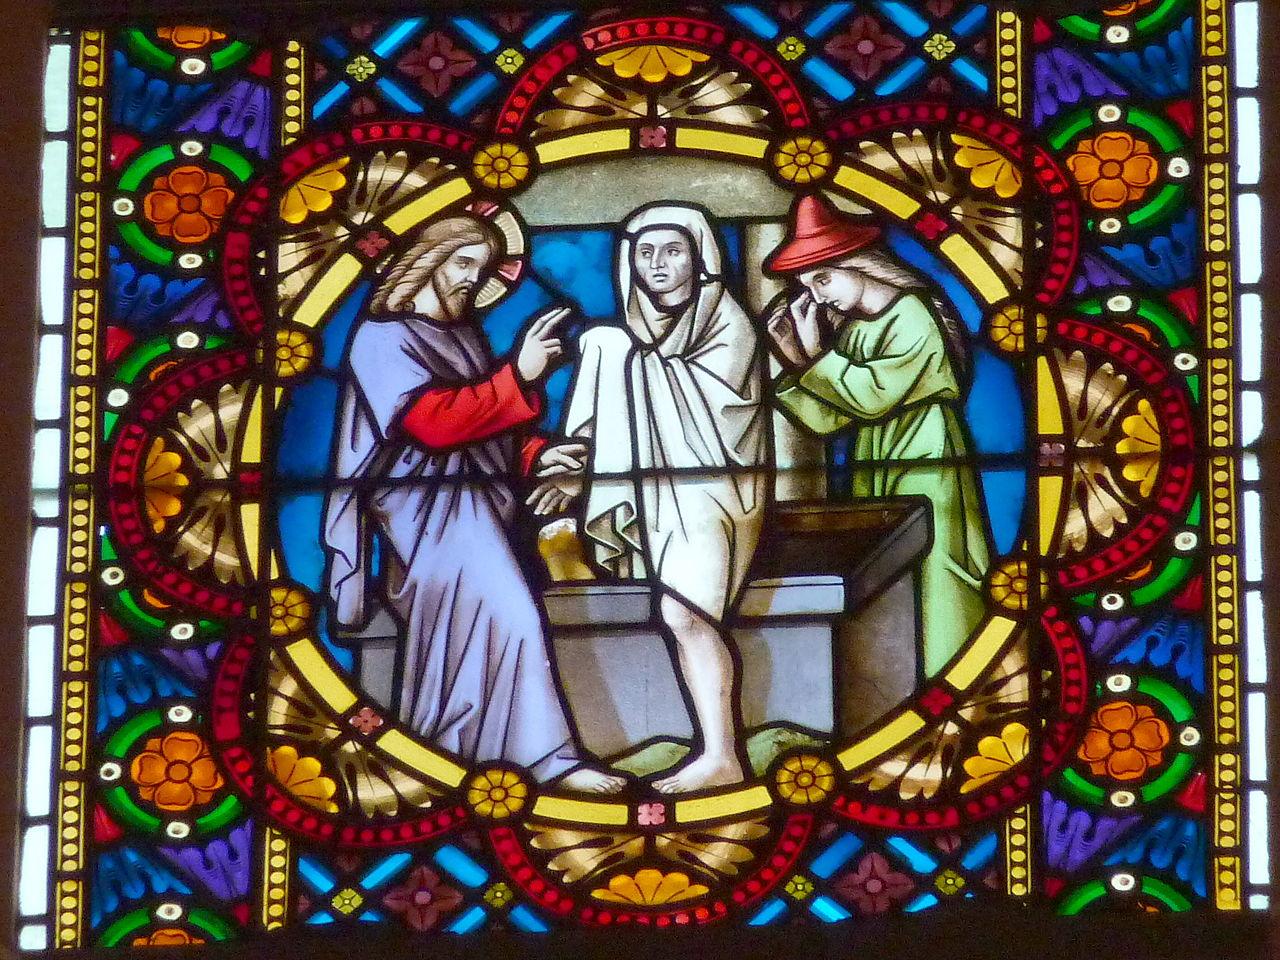 The Raising of Lazarus or the Resurrection of Lazarus